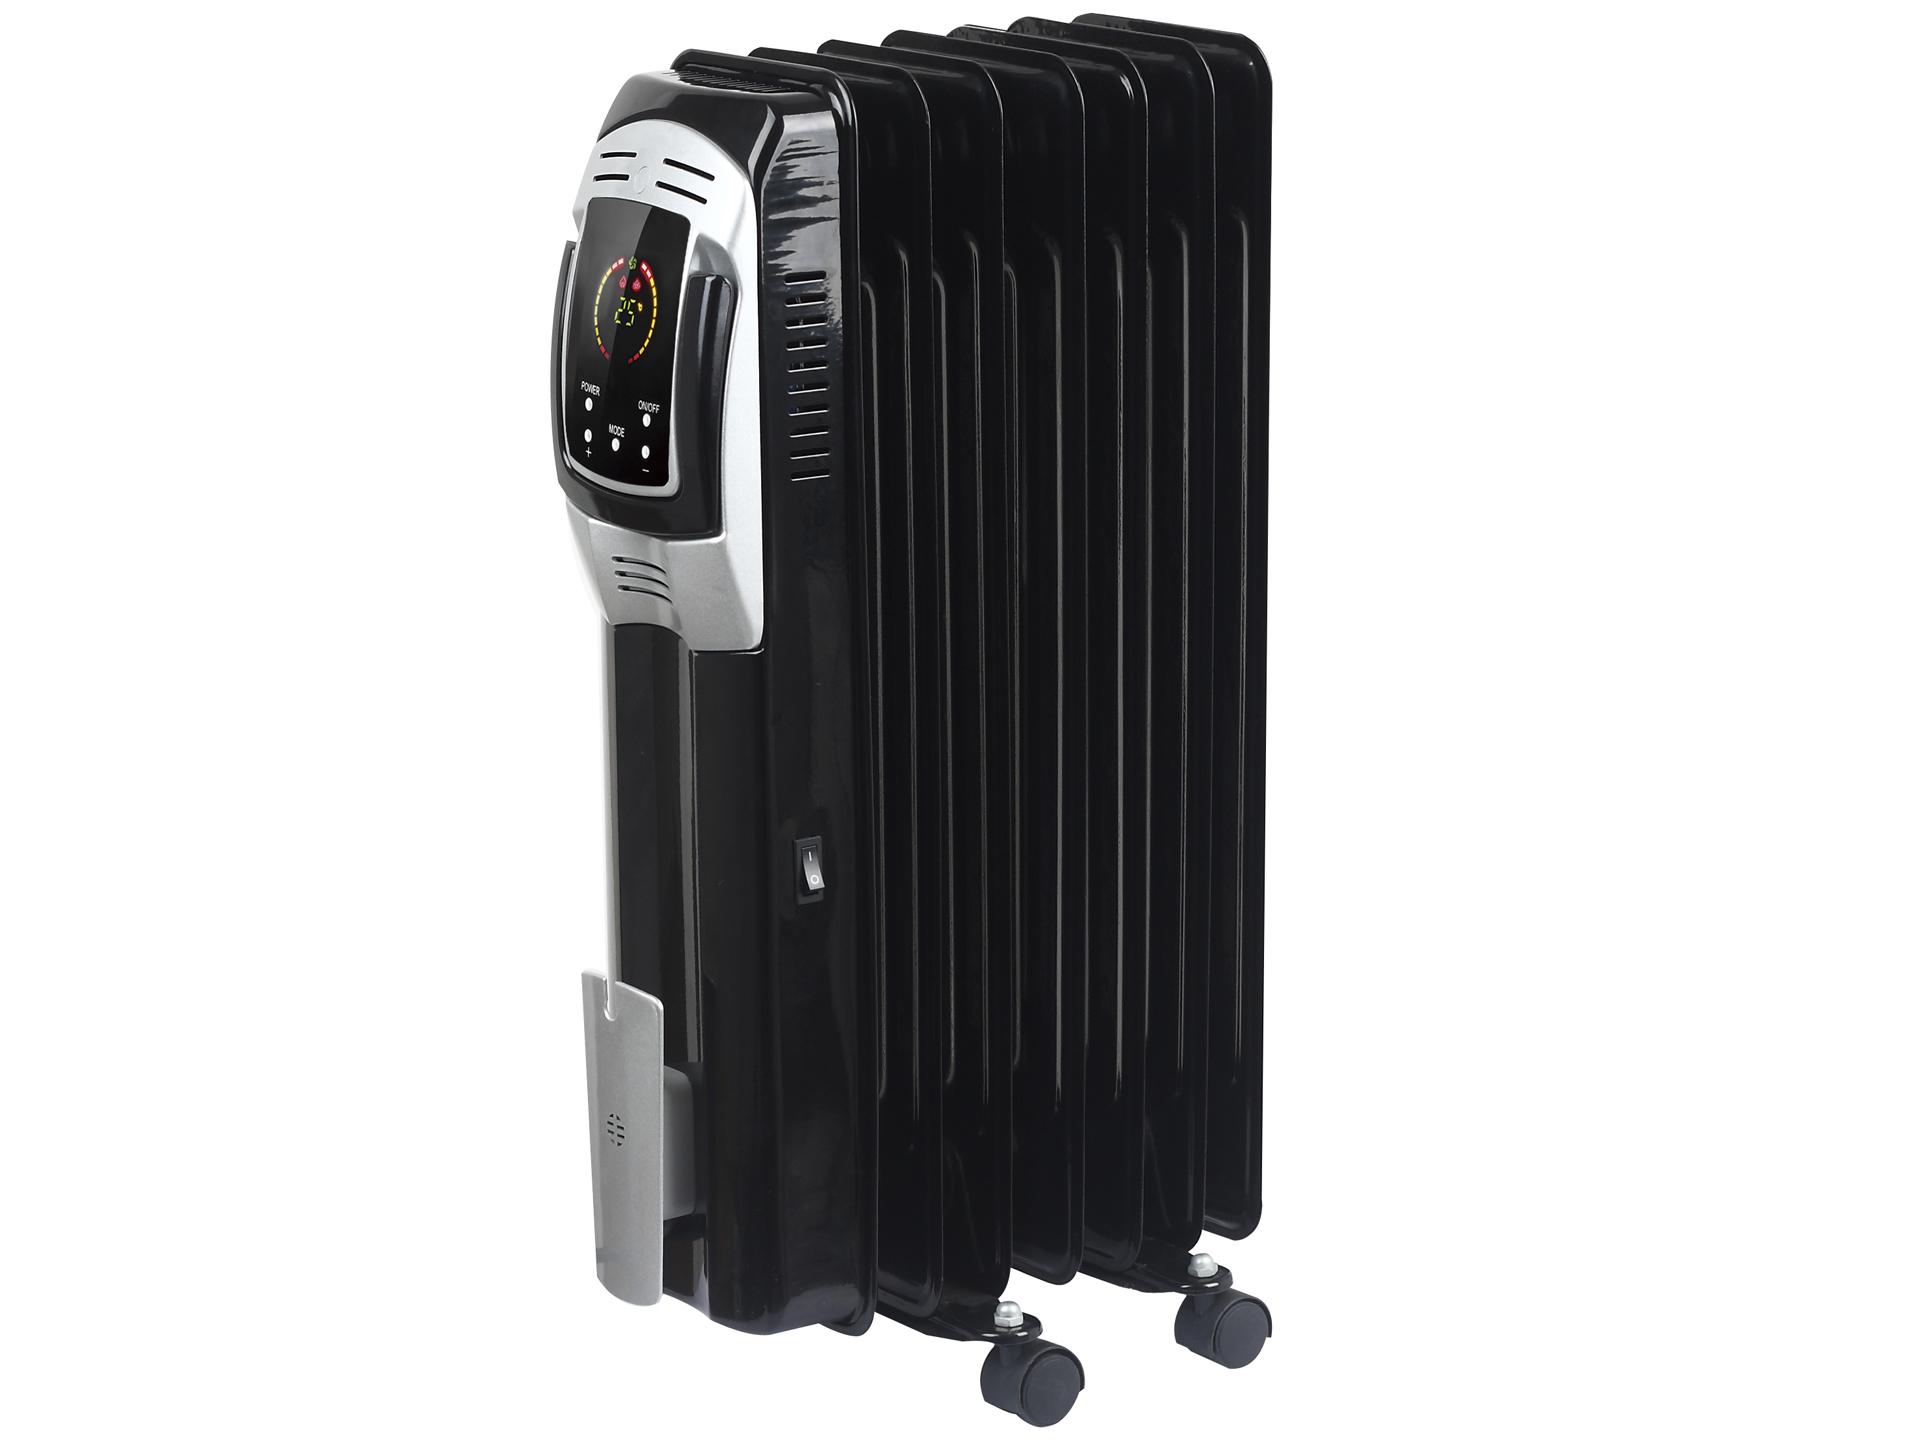 Ahurissant radiateur bain d huile renaa conception - Radiateur bain d huile 1500w ...